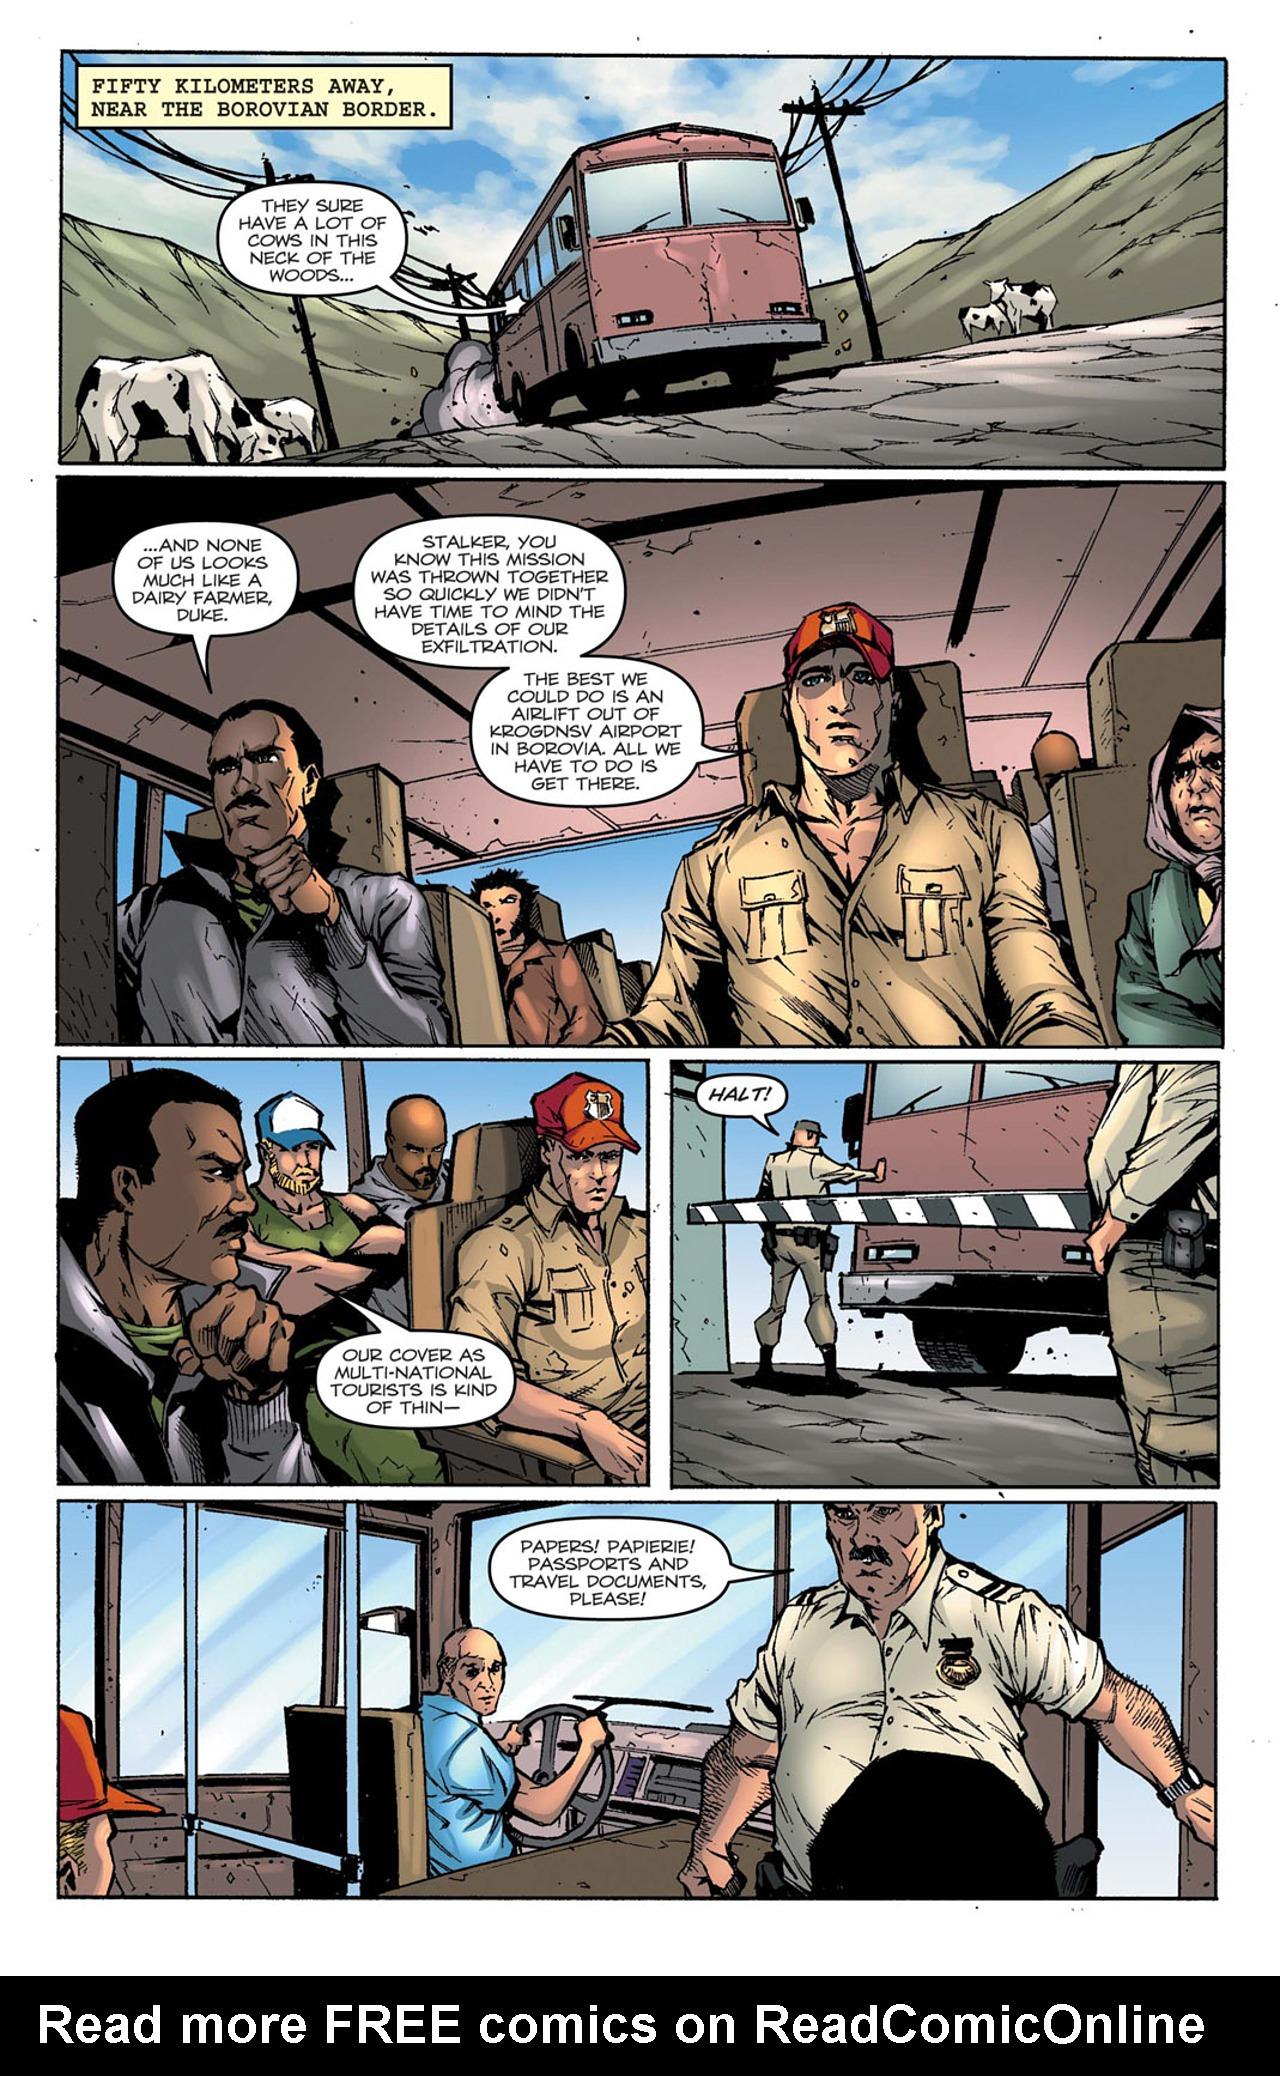 G.I. Joe: A Real American Hero 160 Page 11